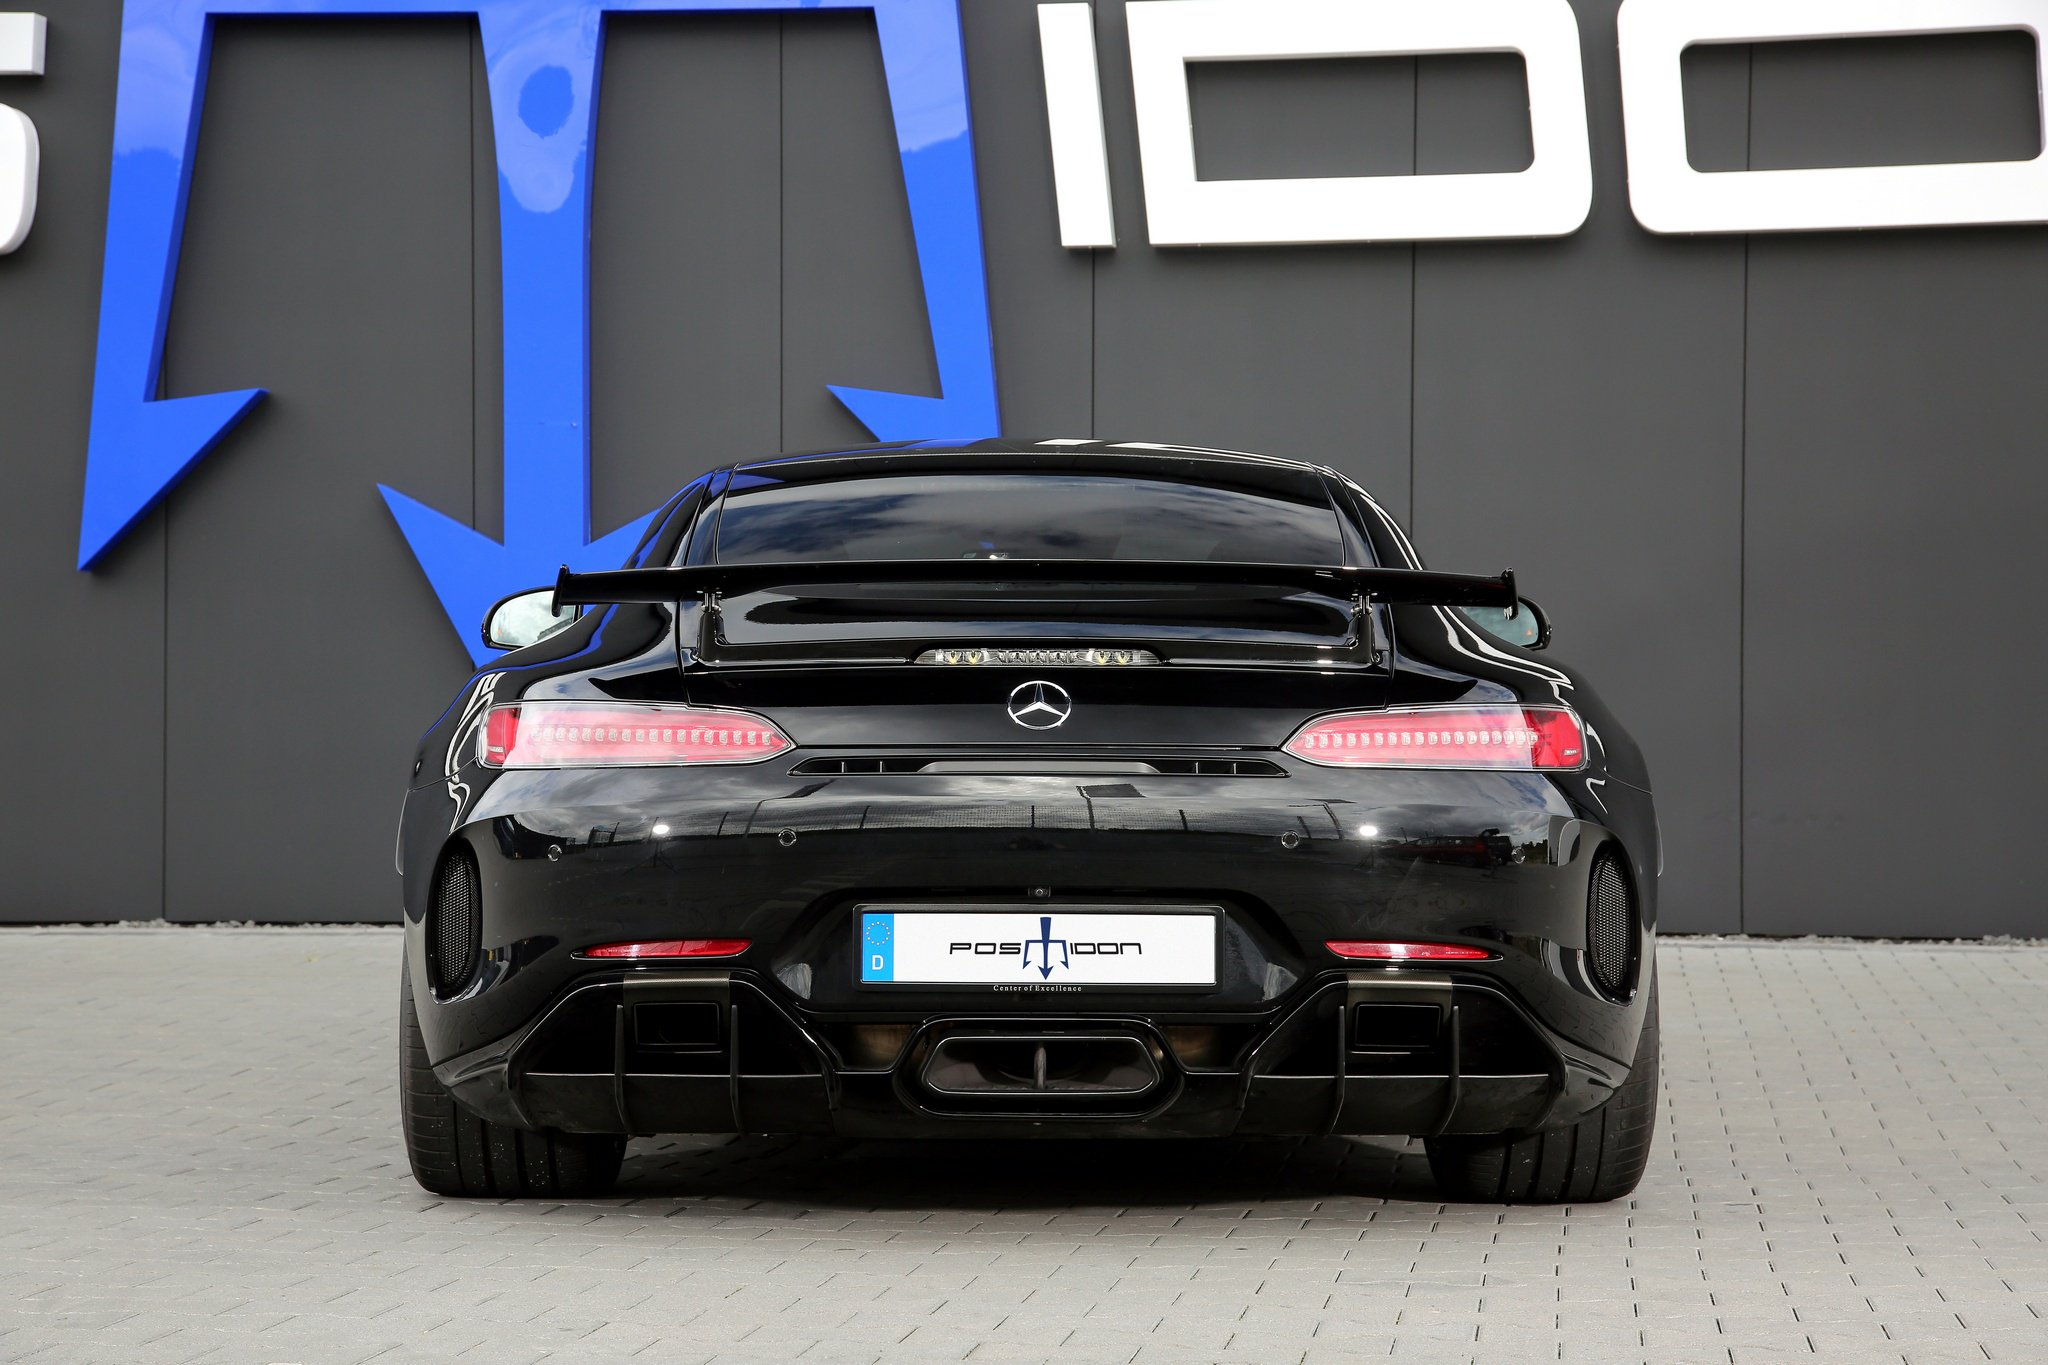 Mercedes-AMG GT R Posaidon